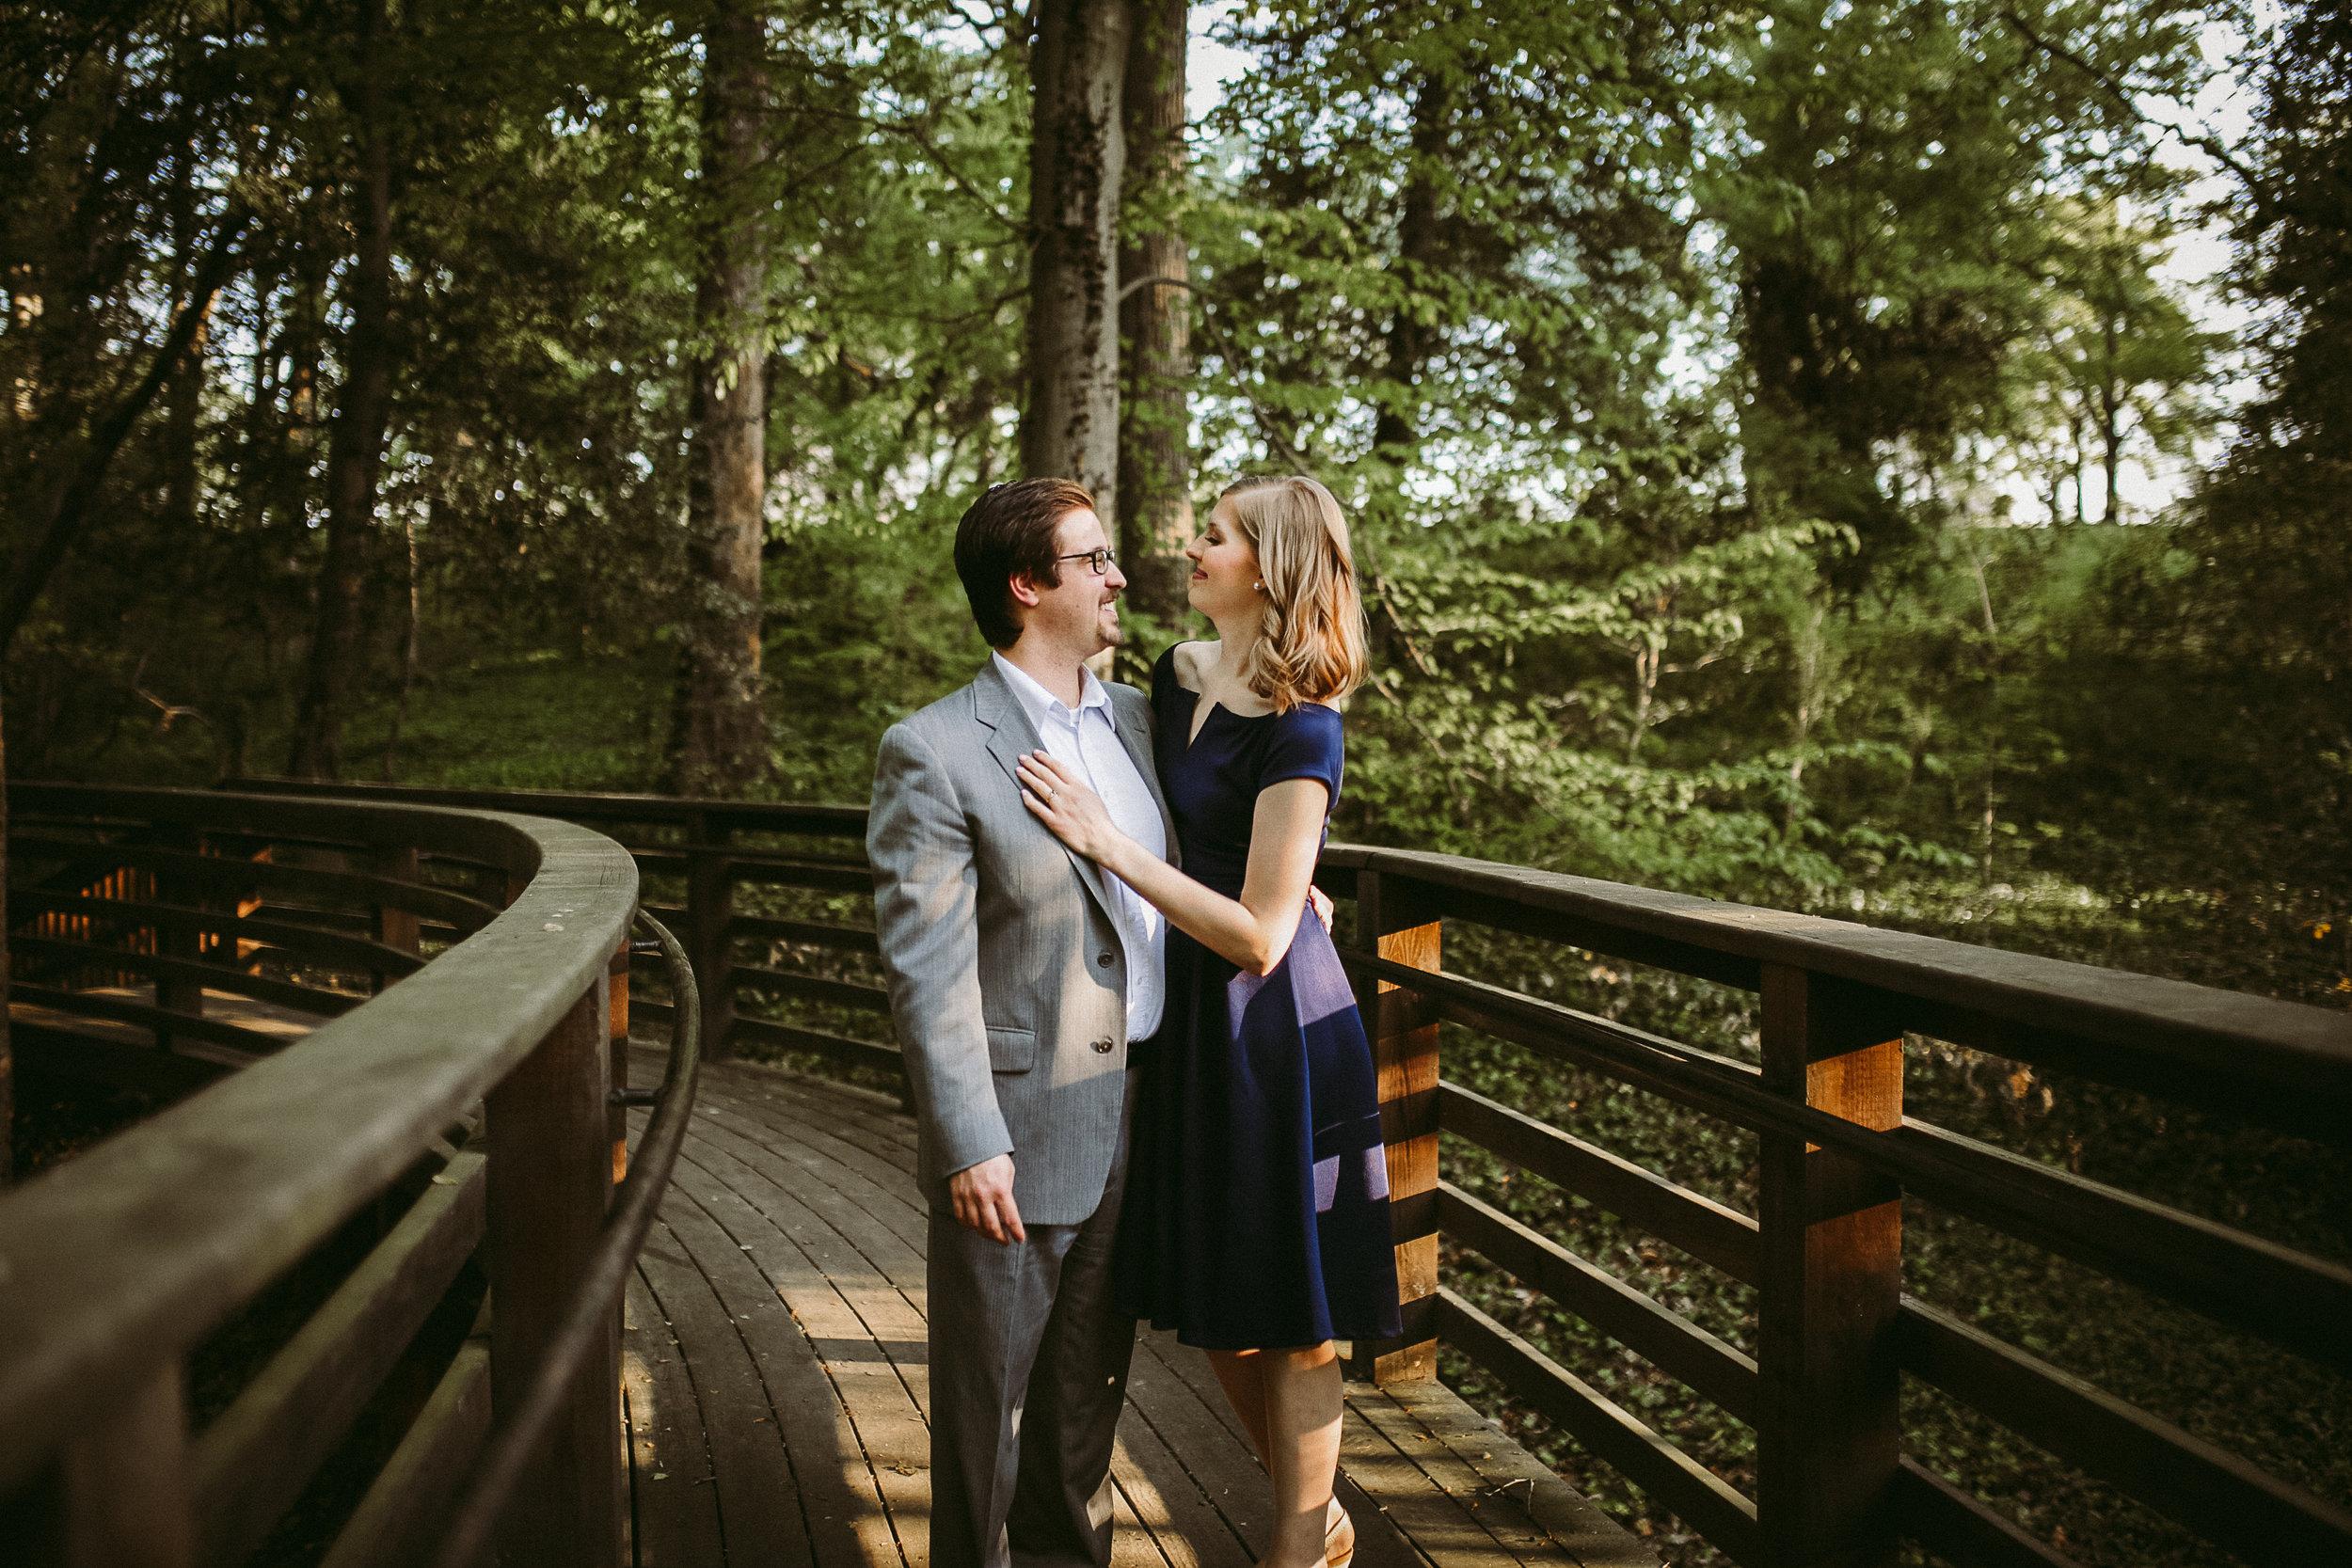 Stephanieandtommyjoe.richmondvirginia.foresthillpark.engagementsession.rebeccaburtphotography-19.jpg